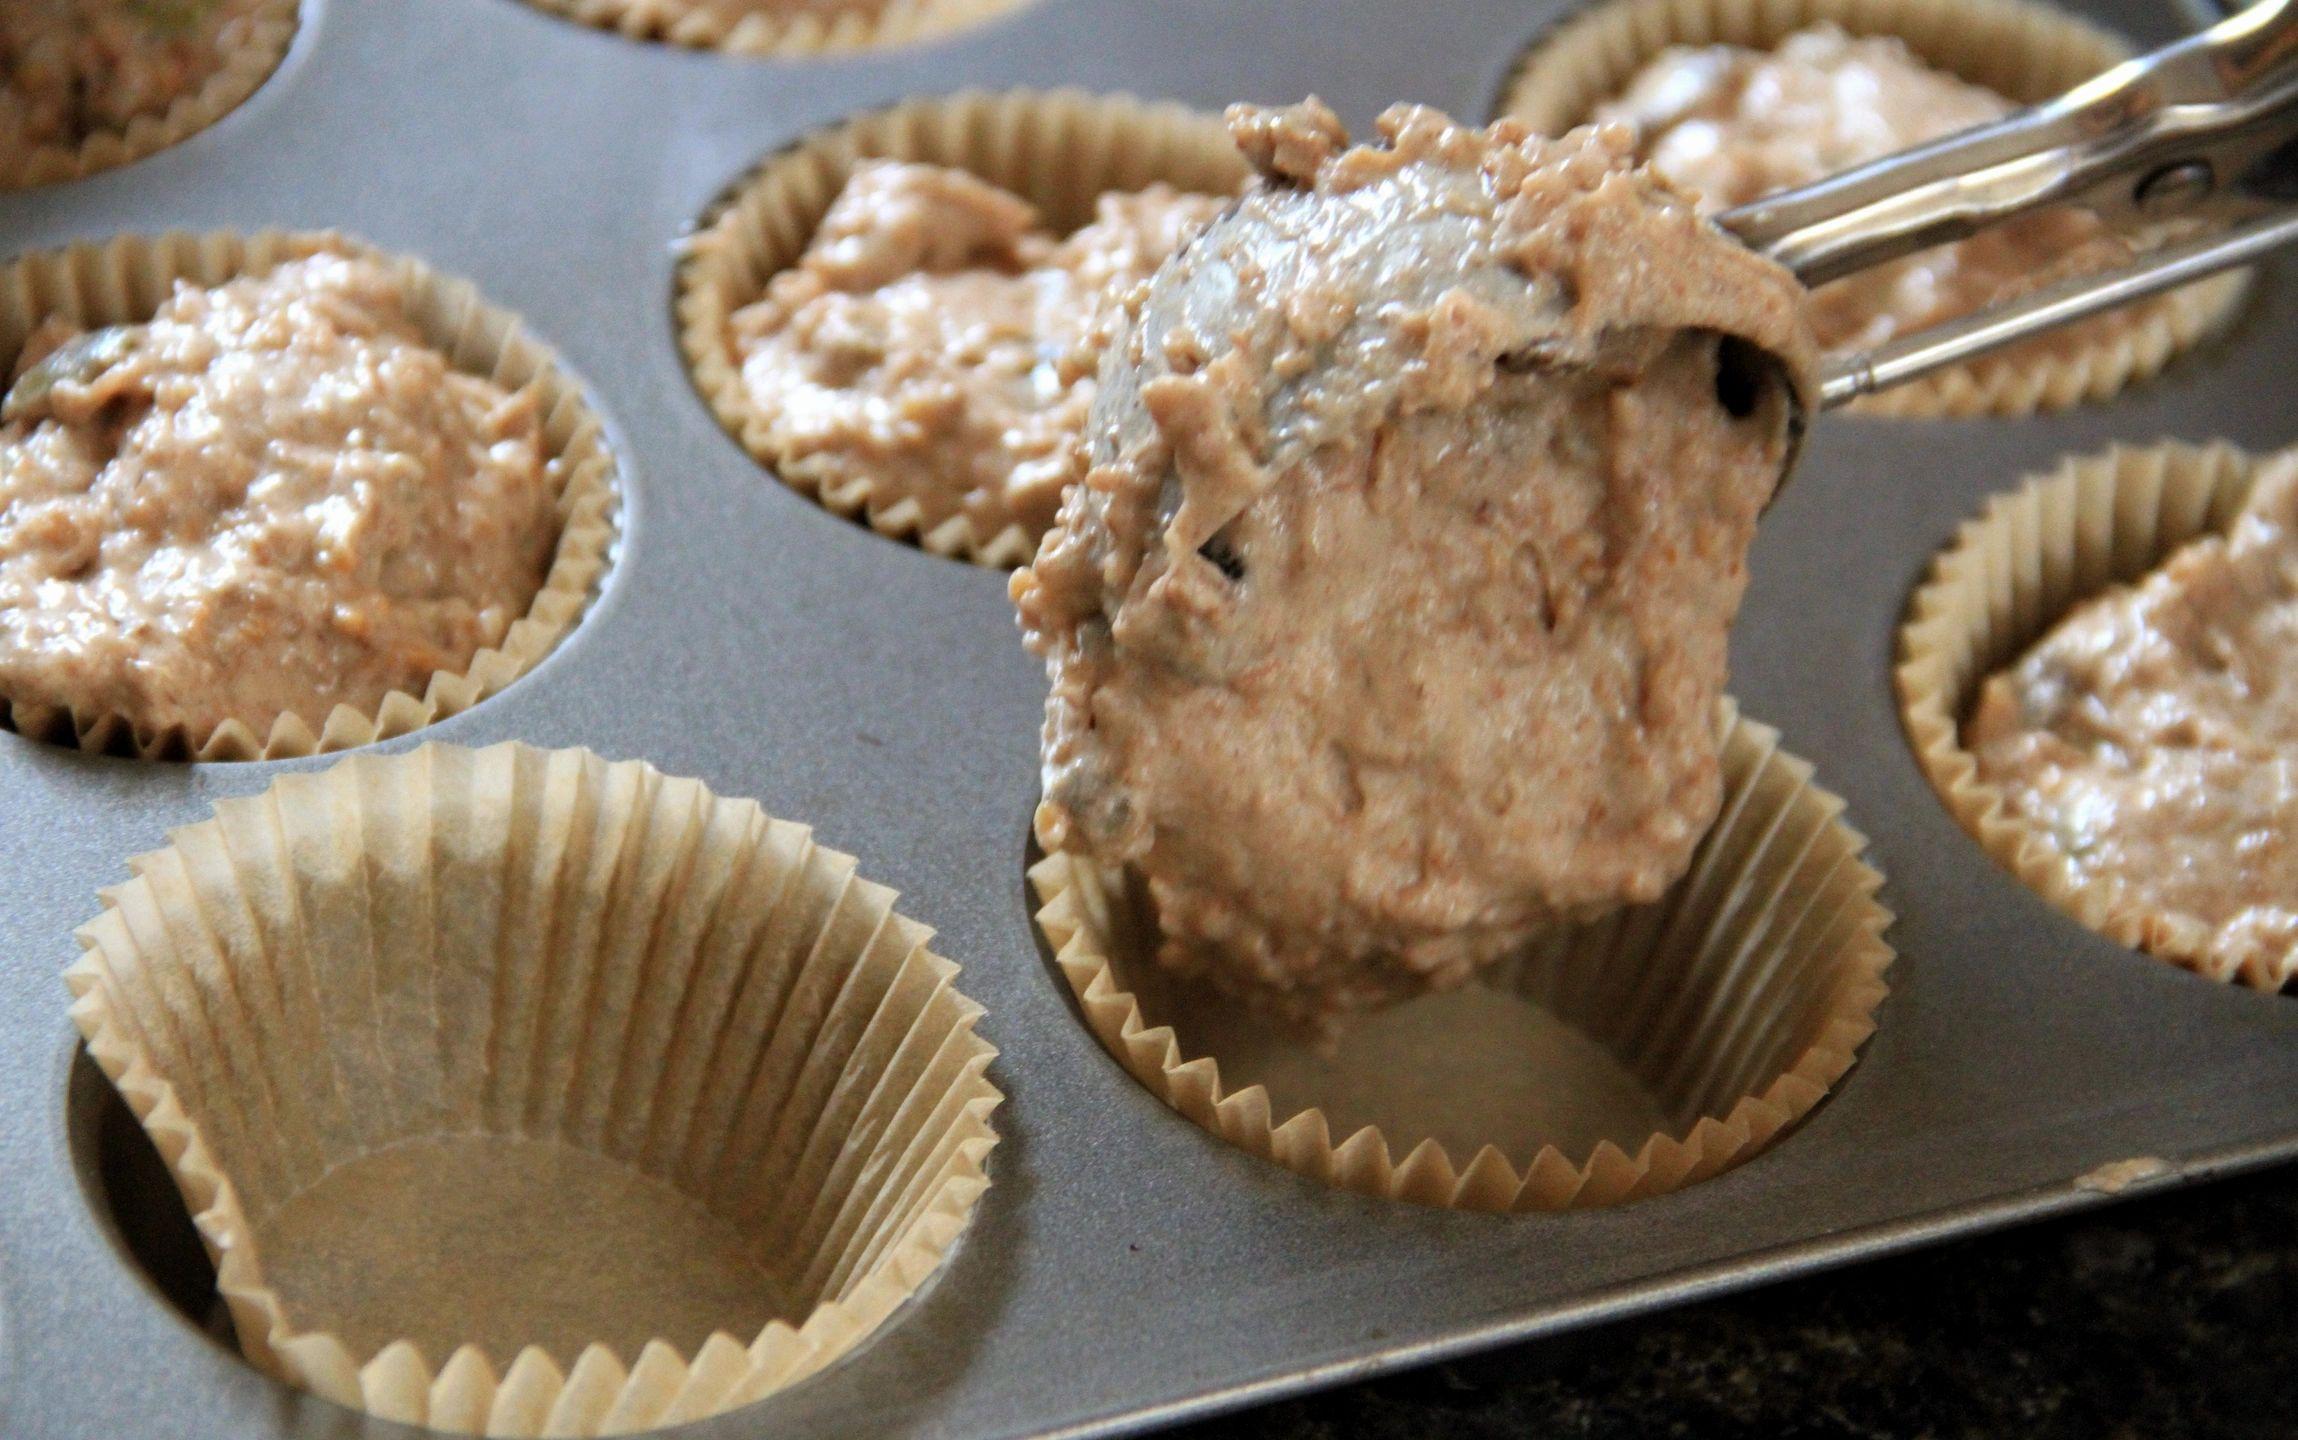 Vegan Baking Tips Using Over Ripe Bananas 🍌